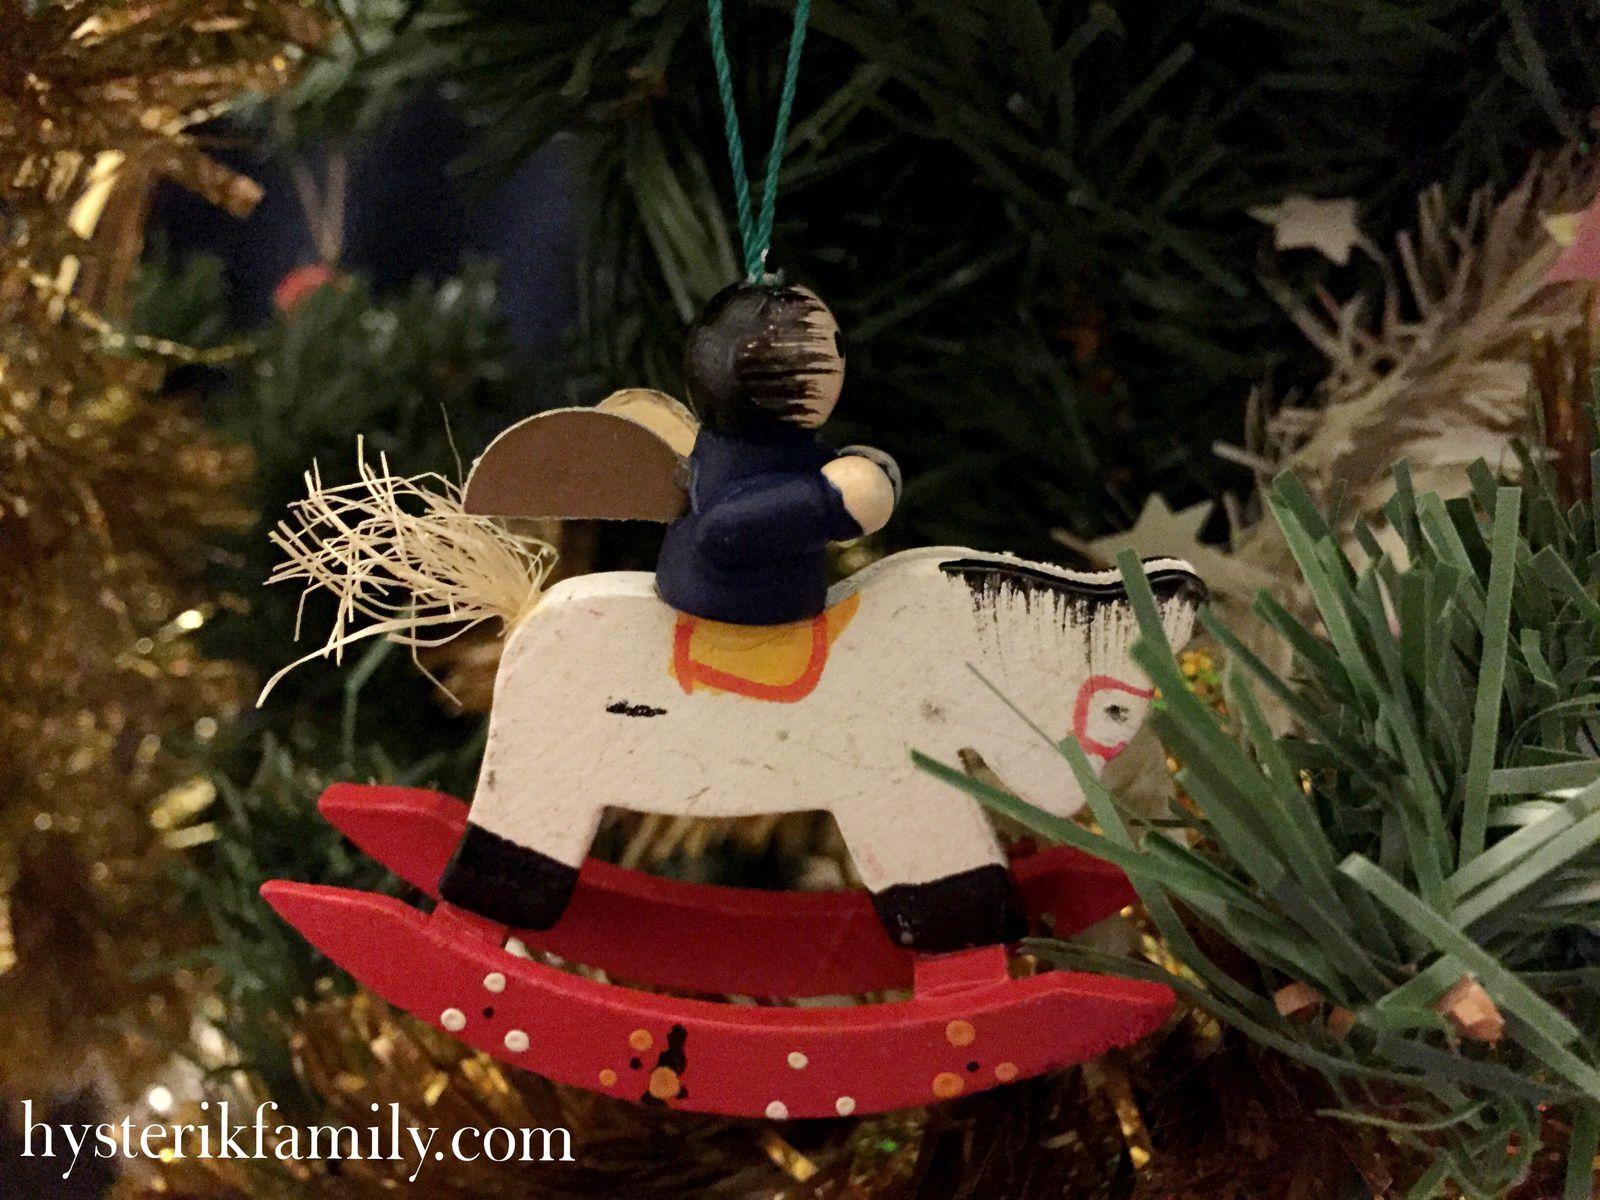 Notre sapin de Noël ...moche !